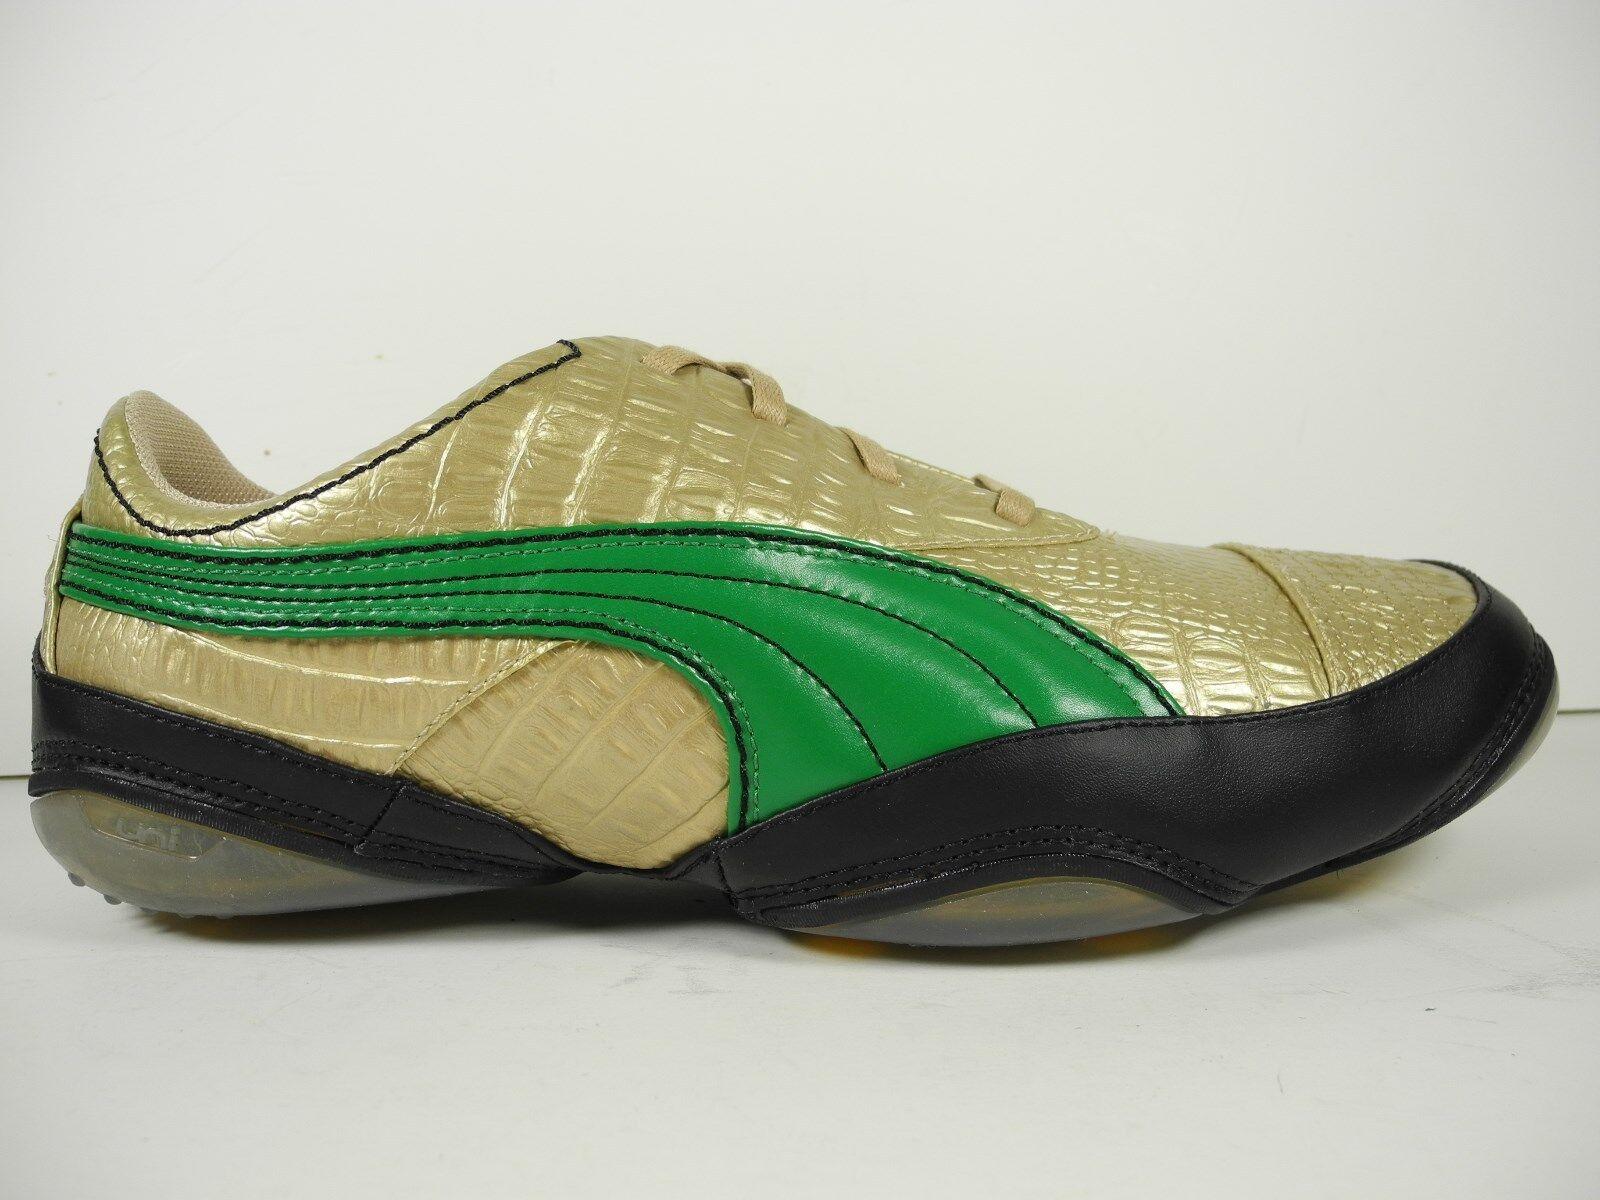 NEW Puma USAN METALLIC CROC Men's shoes Size US 7.5